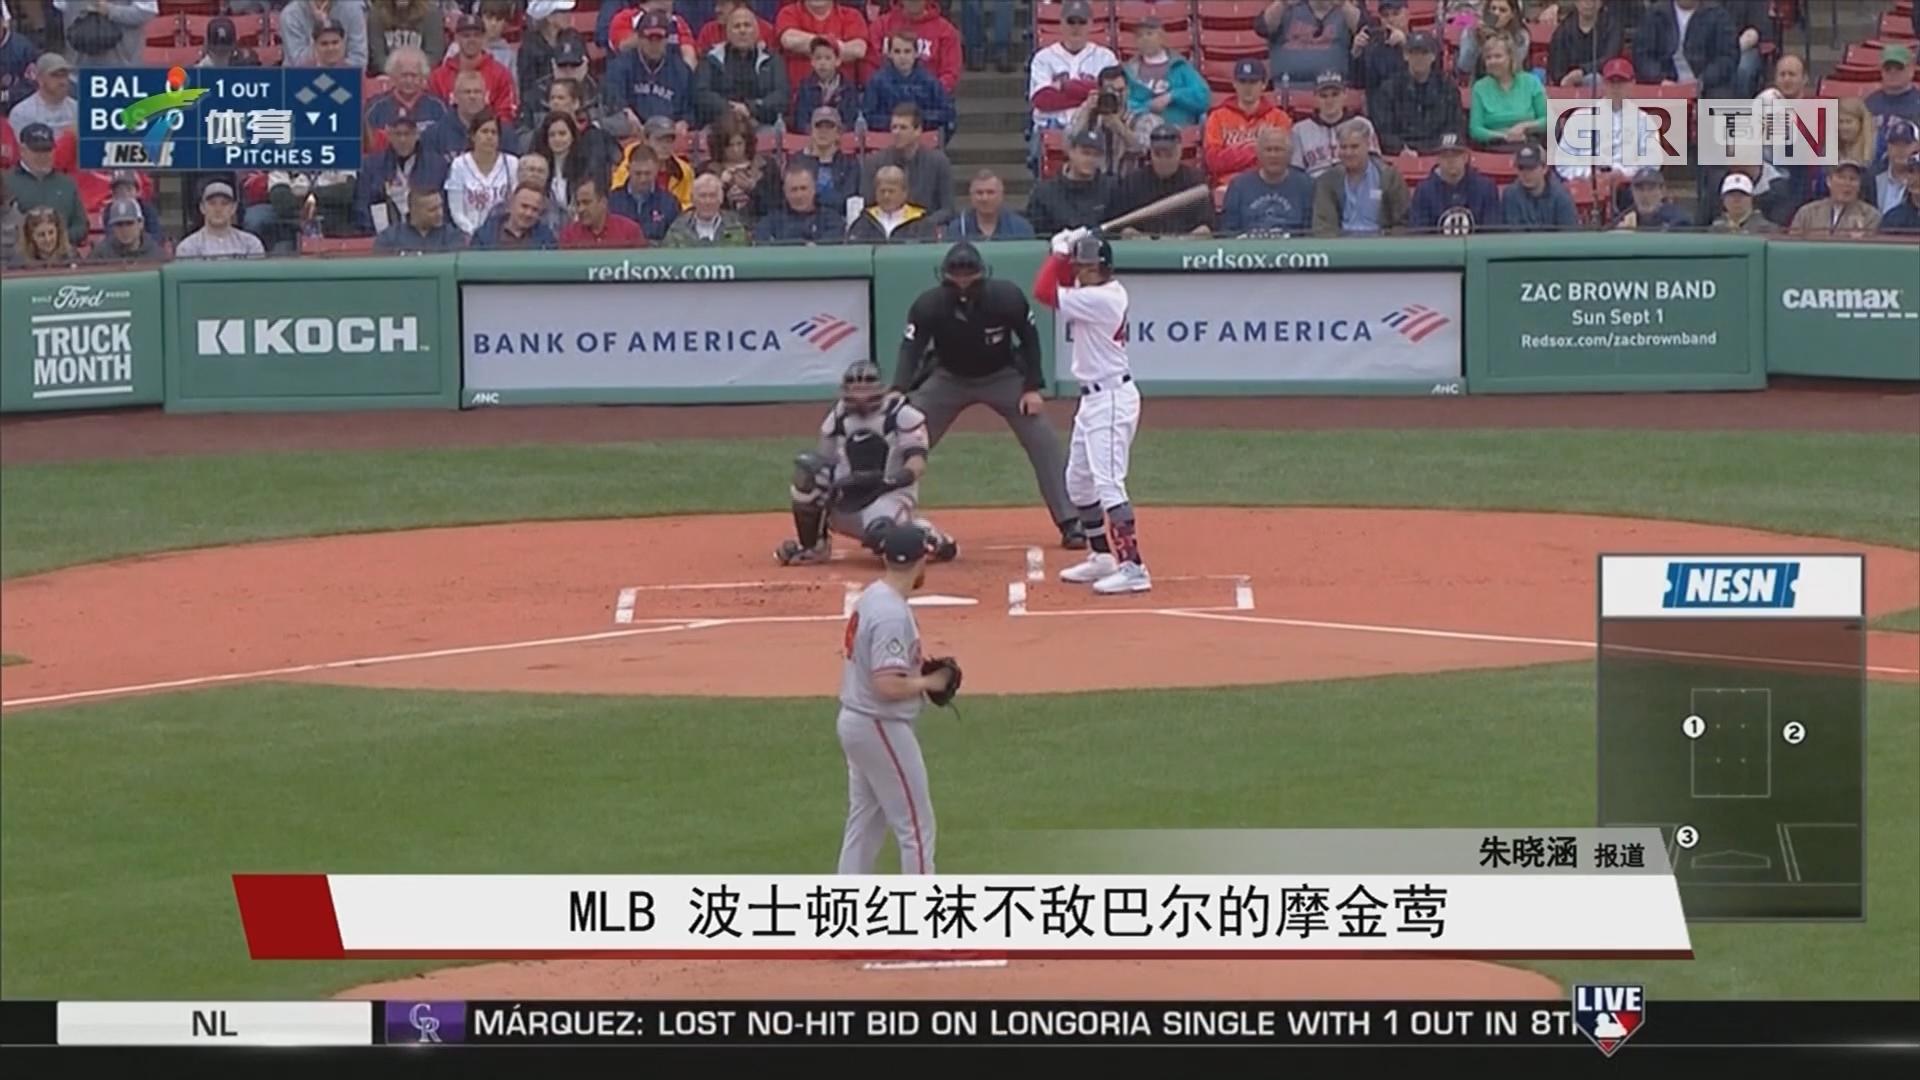 MLB 波士顿红袜不敌巴尔的摩金莺